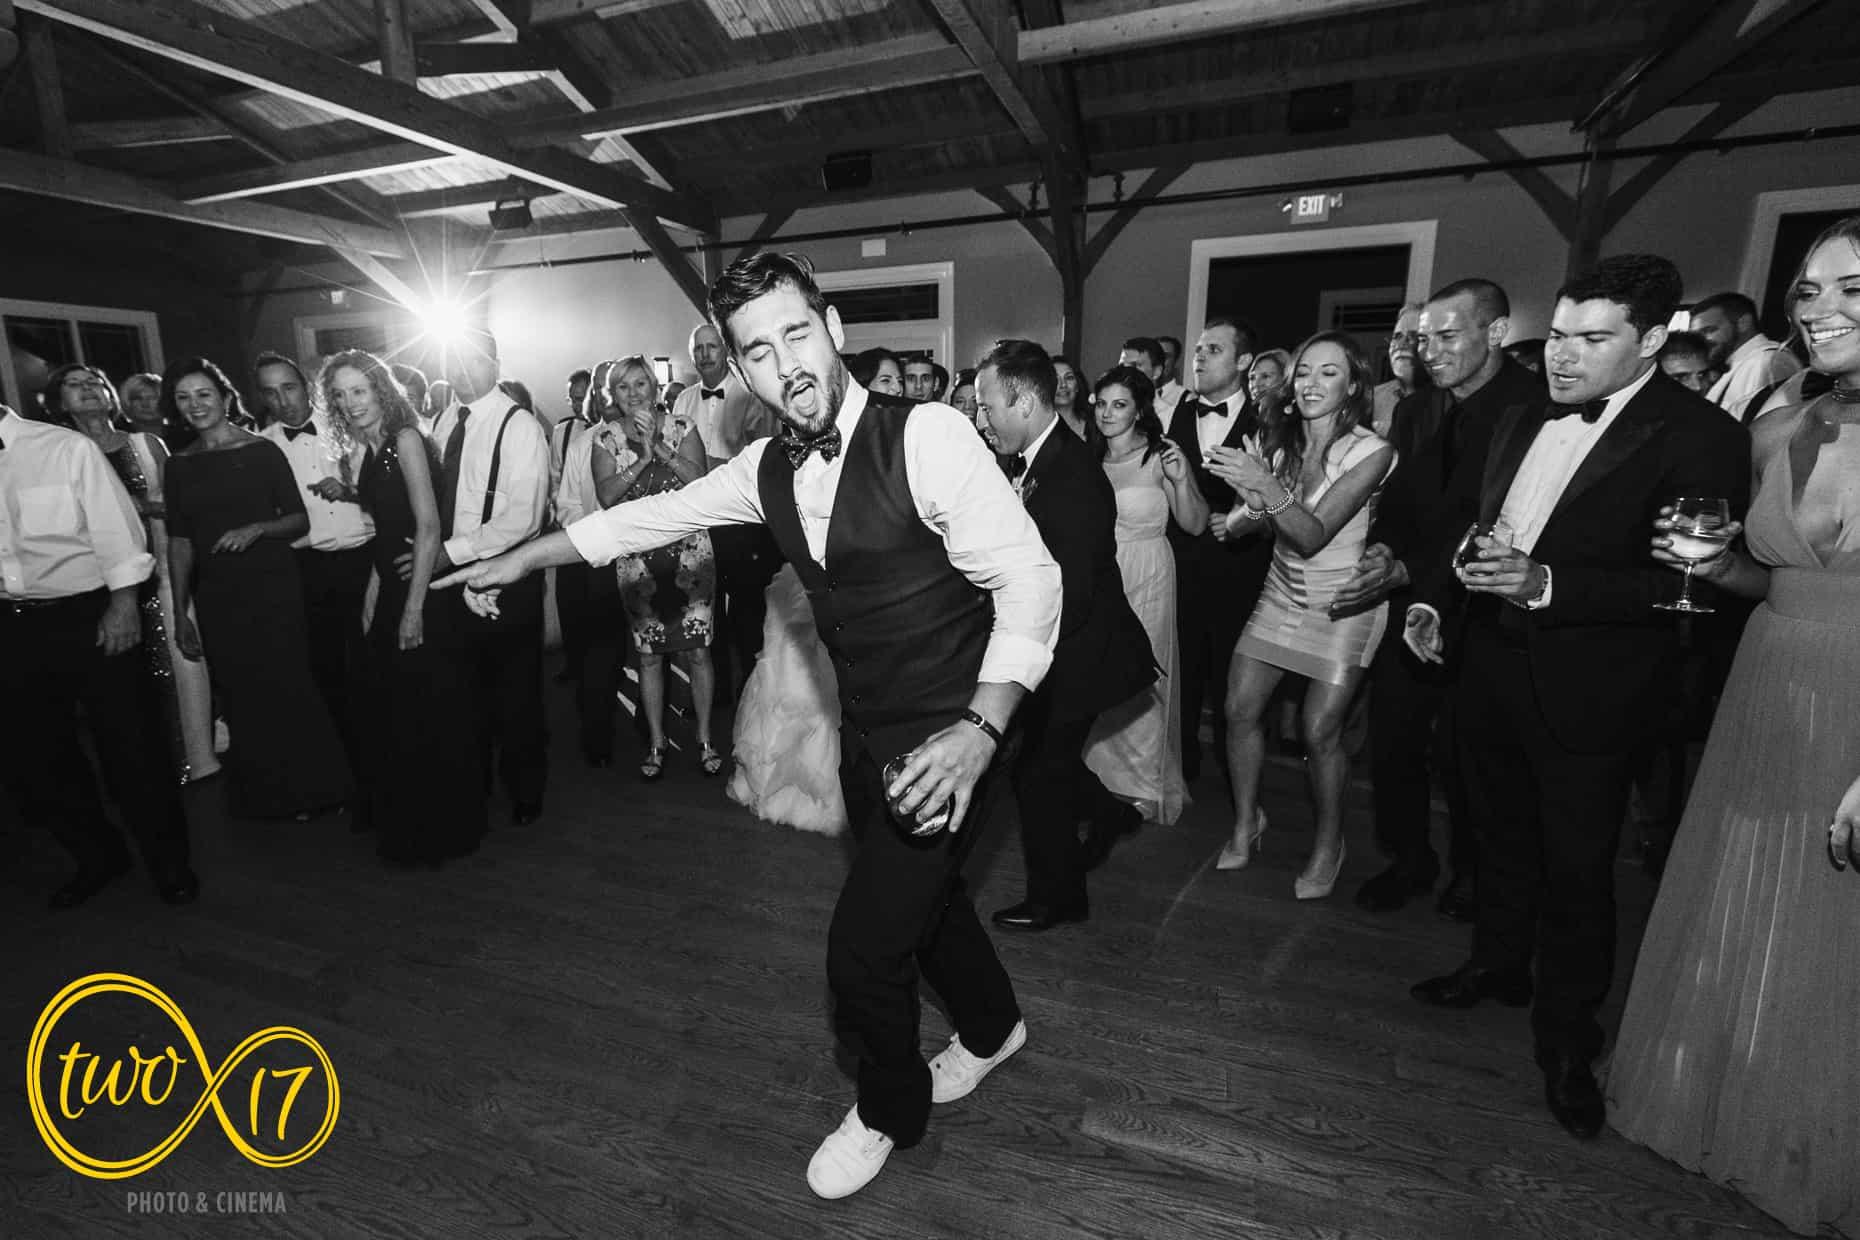 Kristen Barse BelMomento Weddings New Jersey